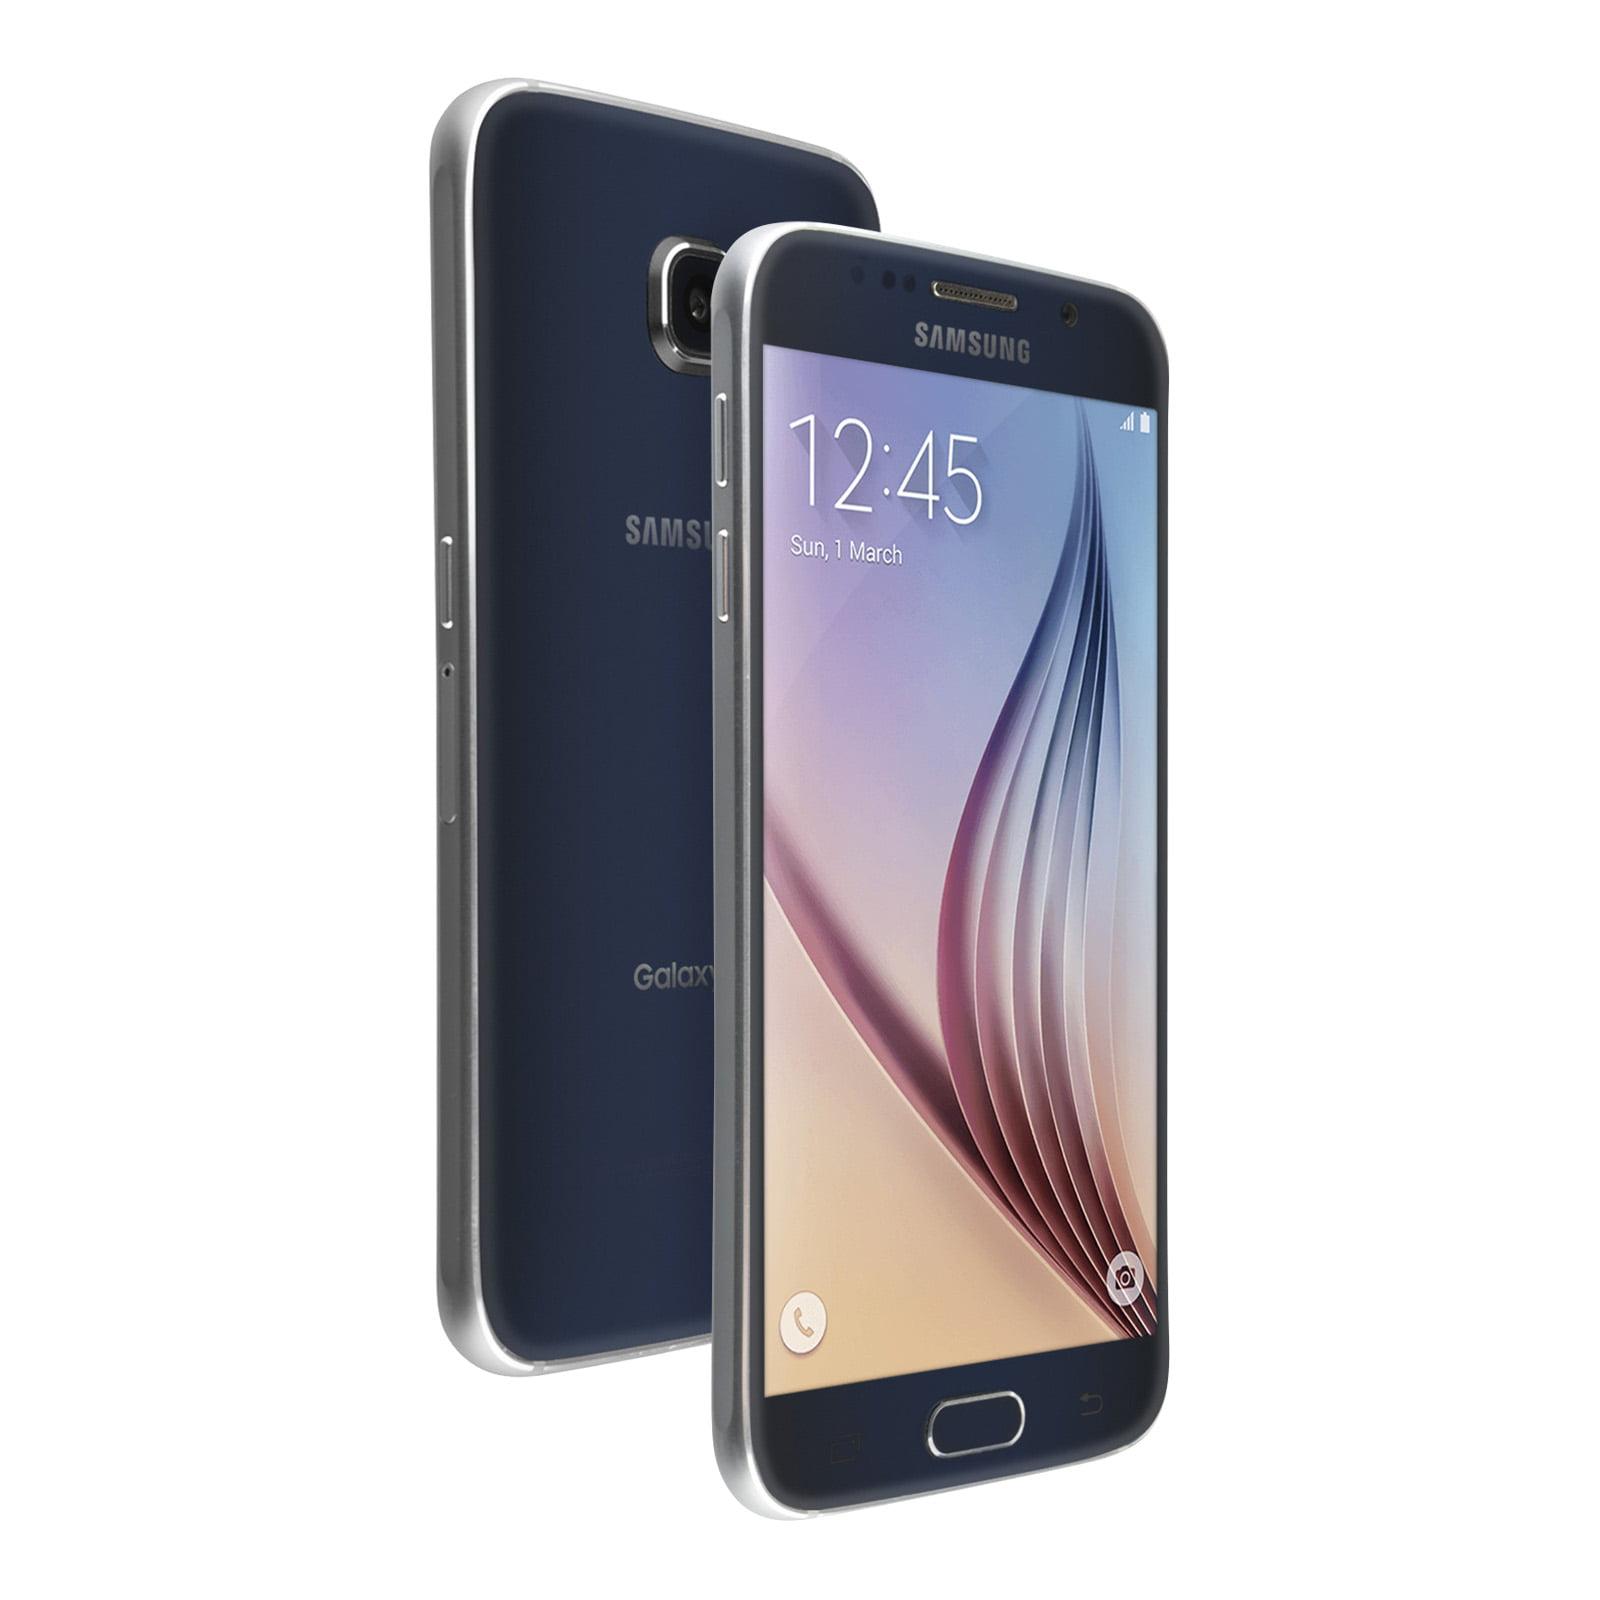 Samsung Galaxy S7 edge Sprint 32GB Blue - Good Condition